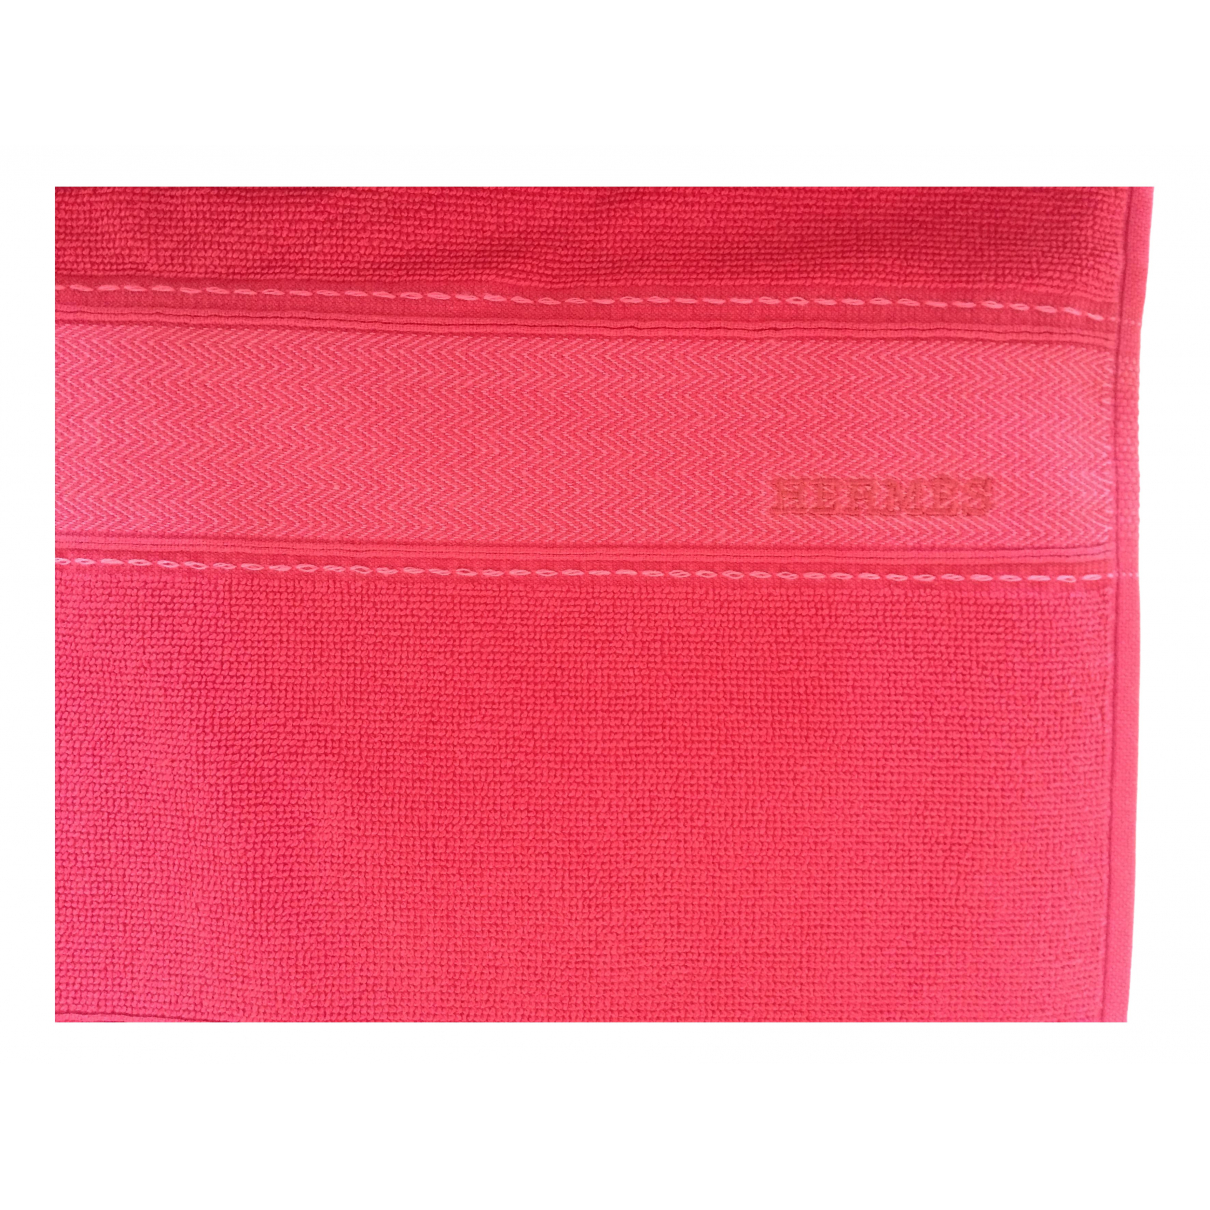 Hermès \N Red Cotton Textiles for Life & Living \N